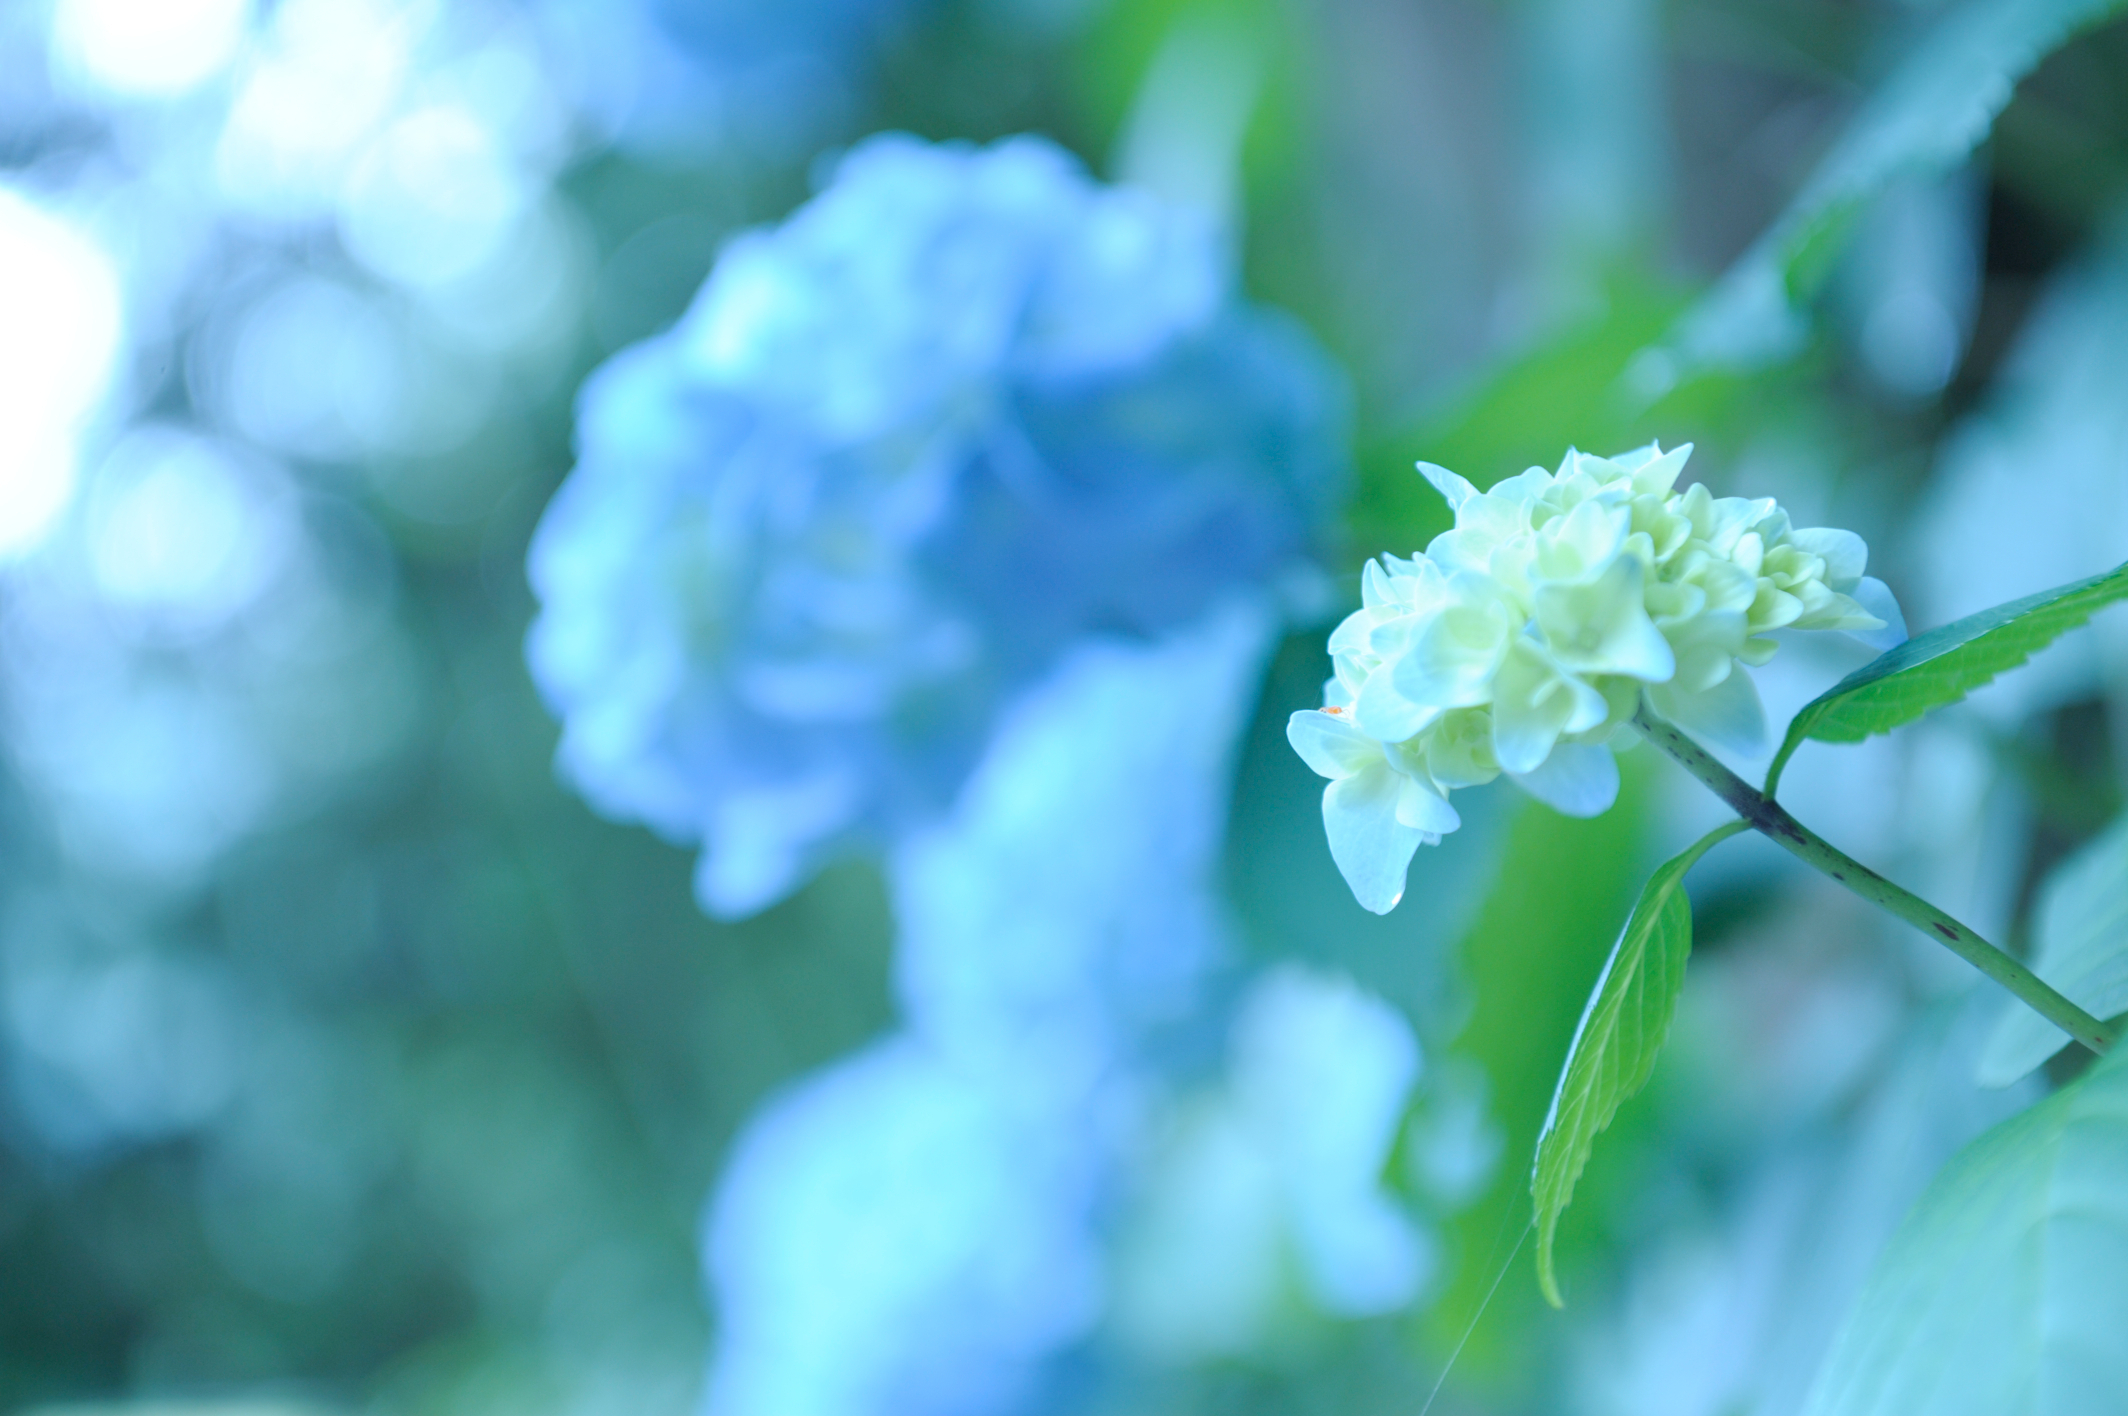 Descarga gratuita de fondo de pantalla para móvil de Flores, Plantas.